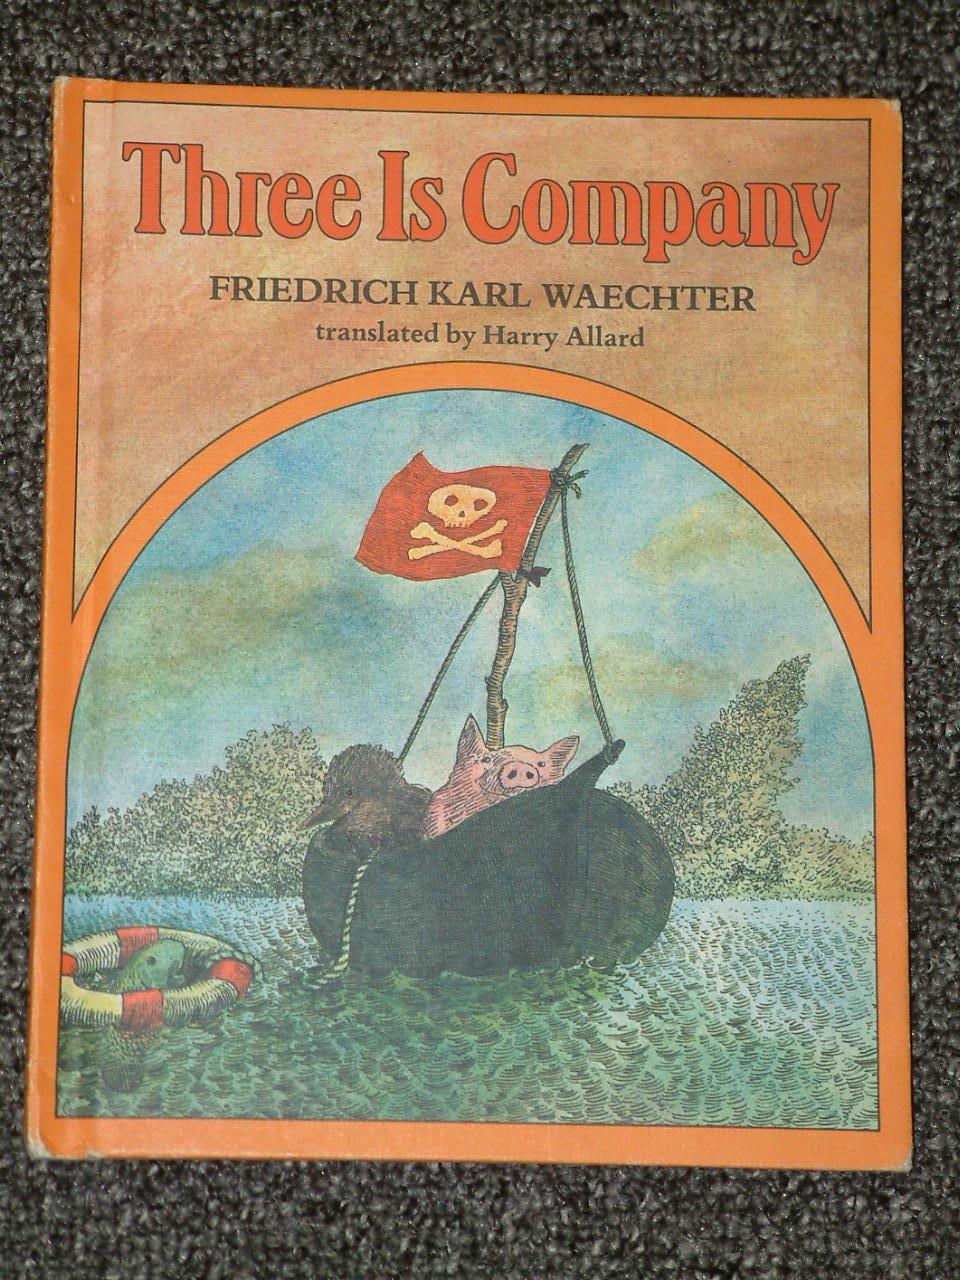 Three is Company by Friedrich Karl Waechter